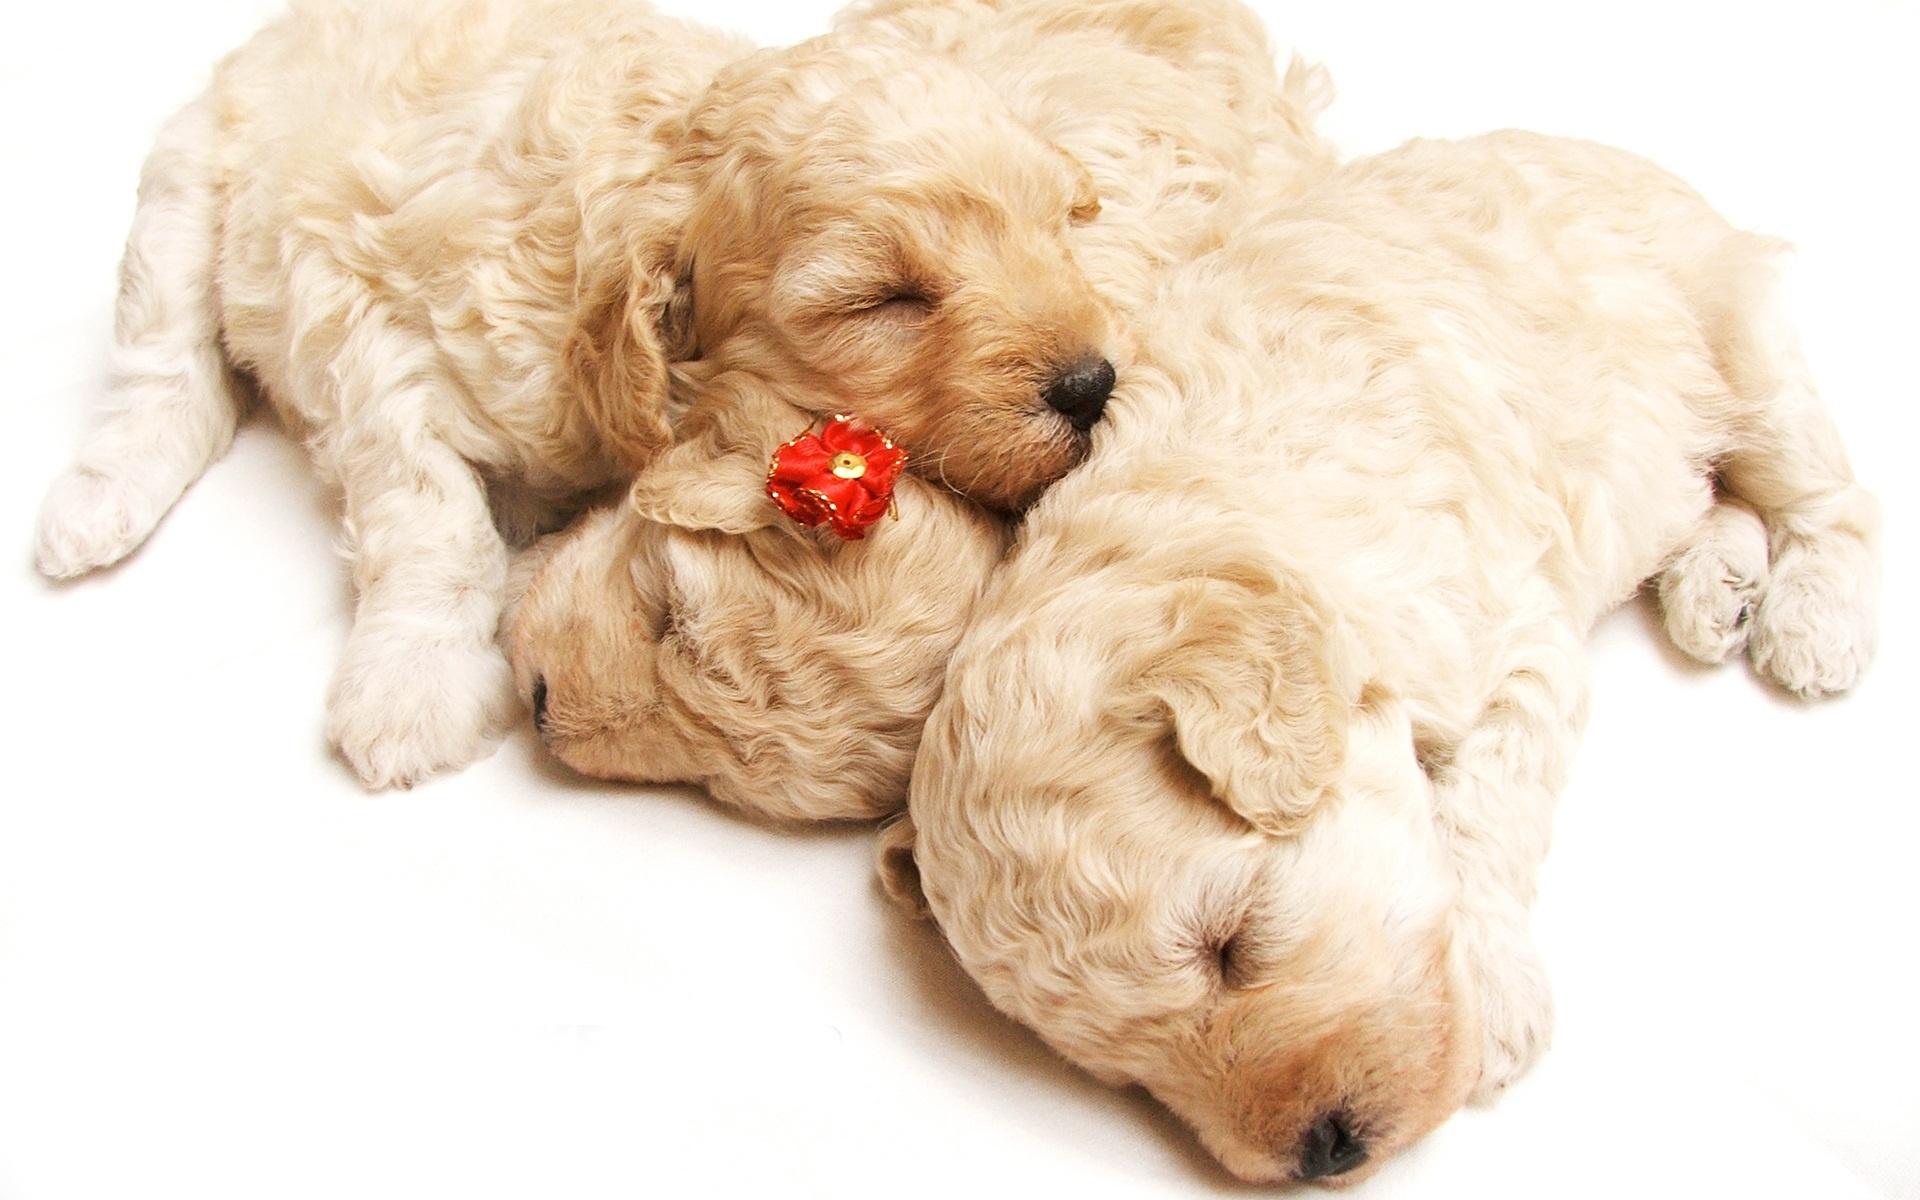 Cute Sleeping Puppies Wallpapers HD Wallpapers 1920x1200